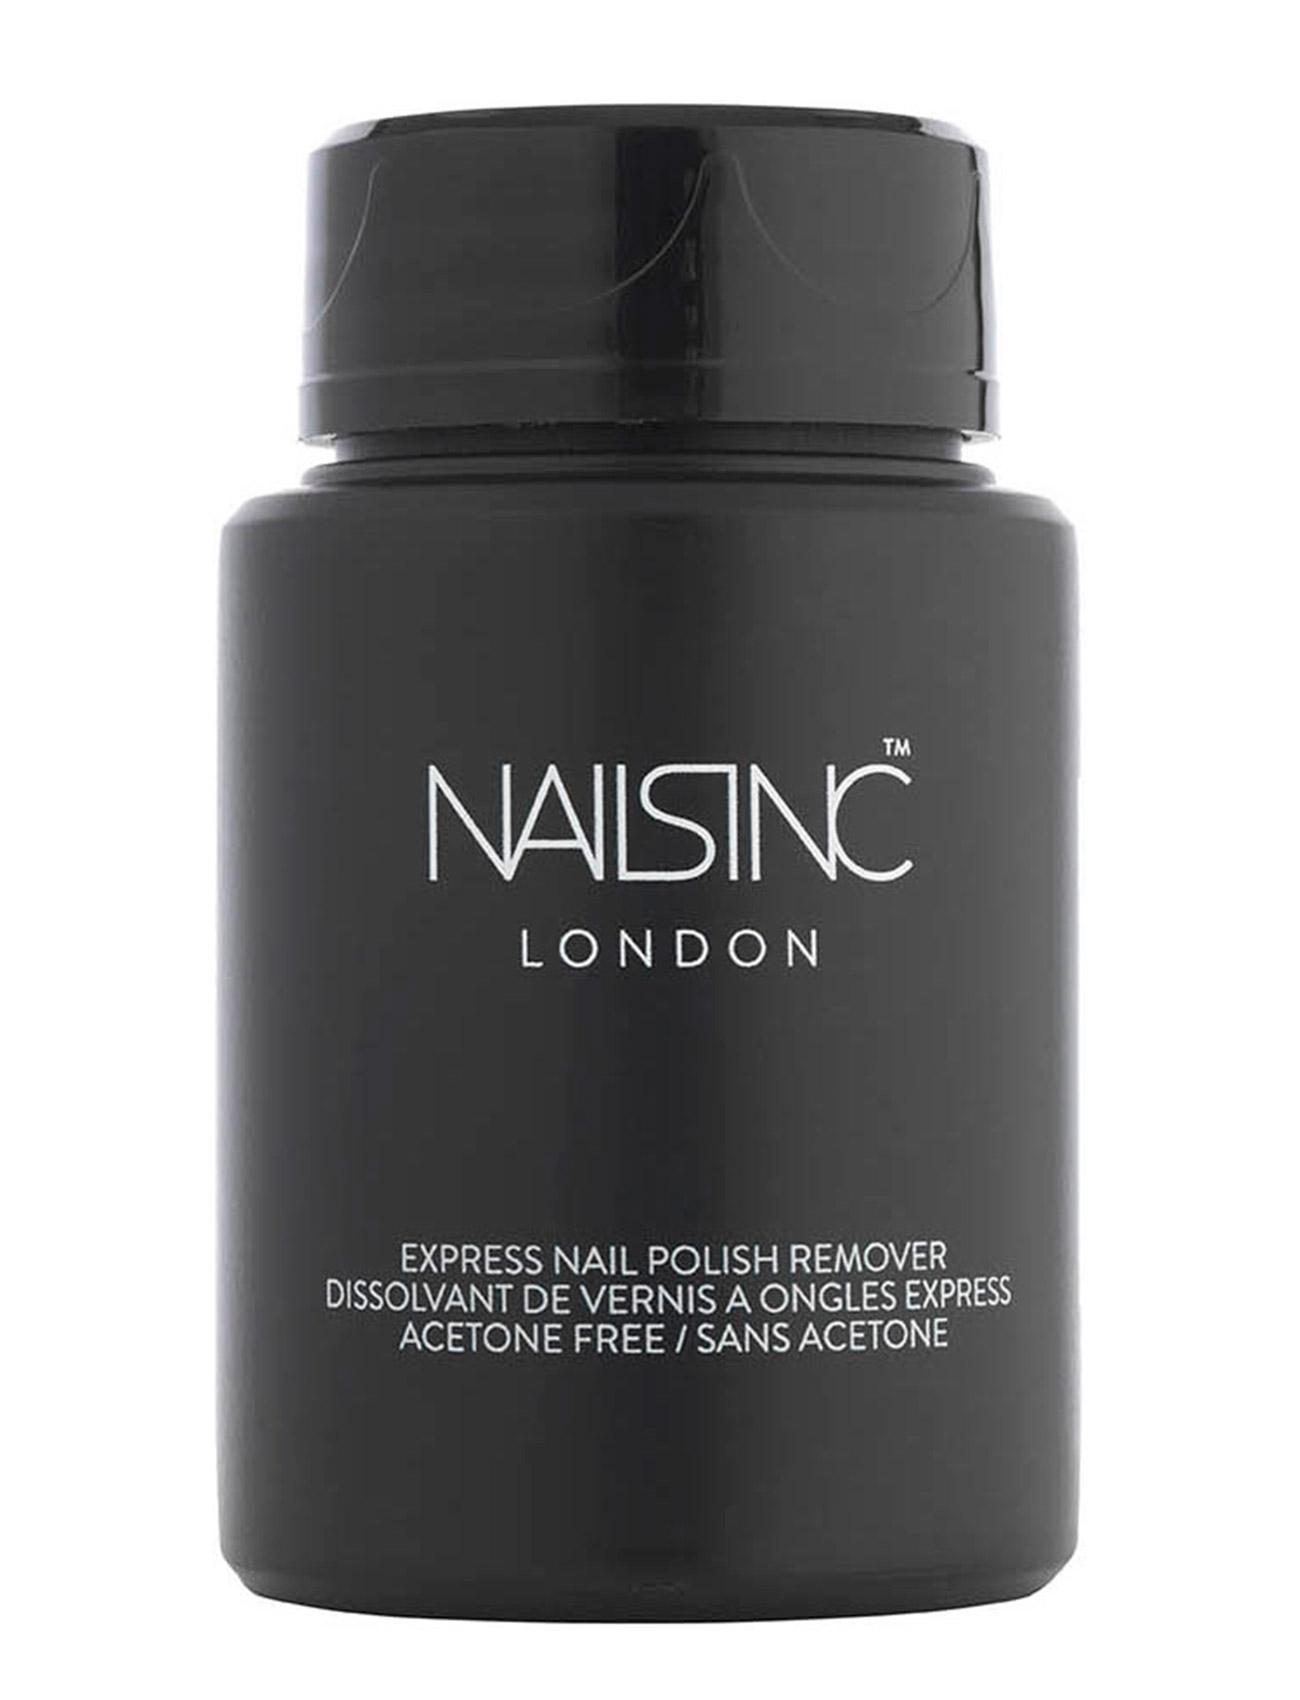 Express nail polish remover acetone free fra nails inc fra boozt.com dk